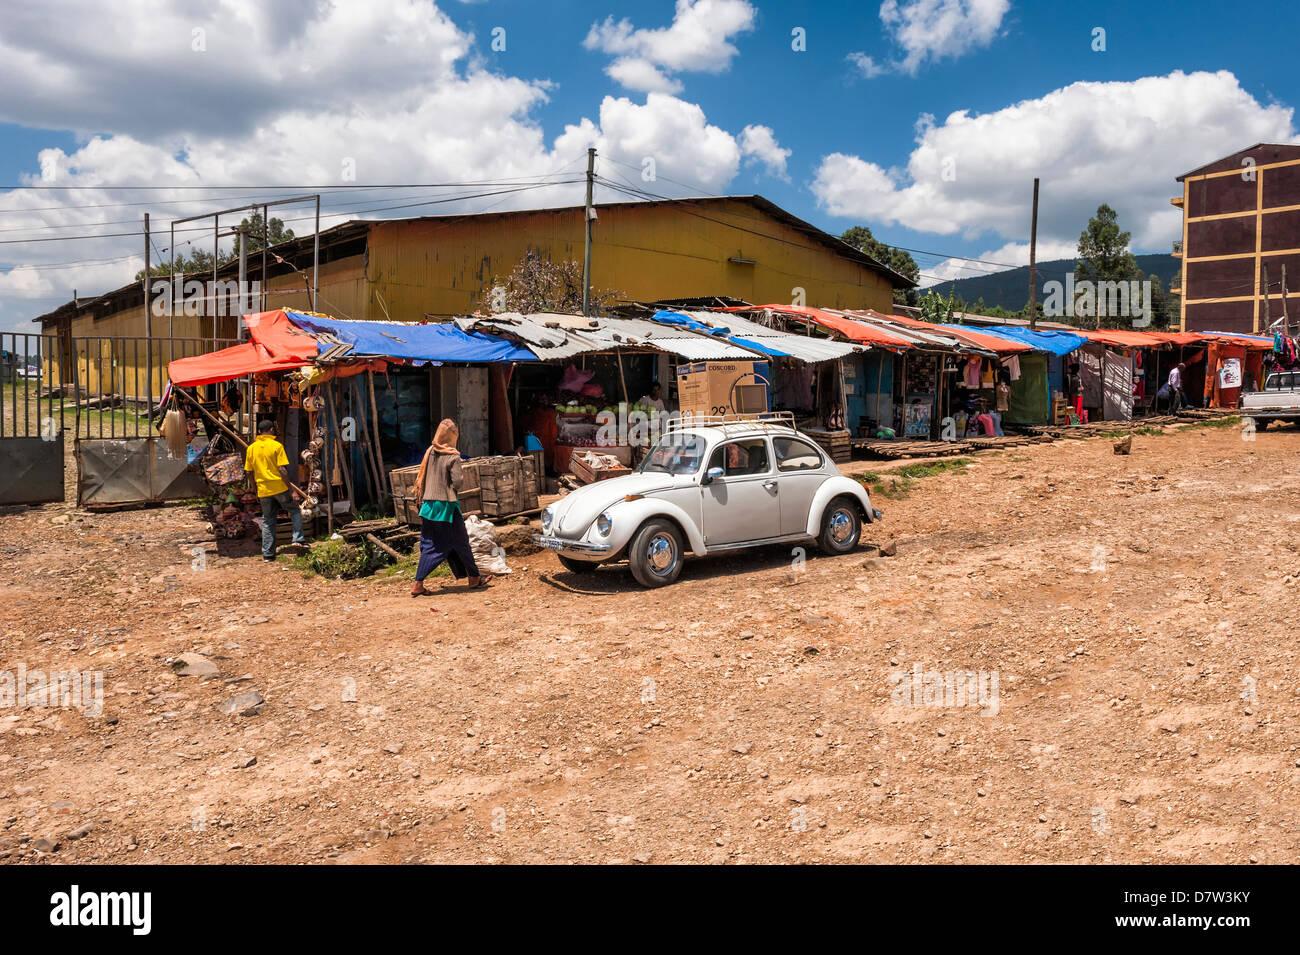 Street scene, Addis Ababa, Ethiopia - Stock Image